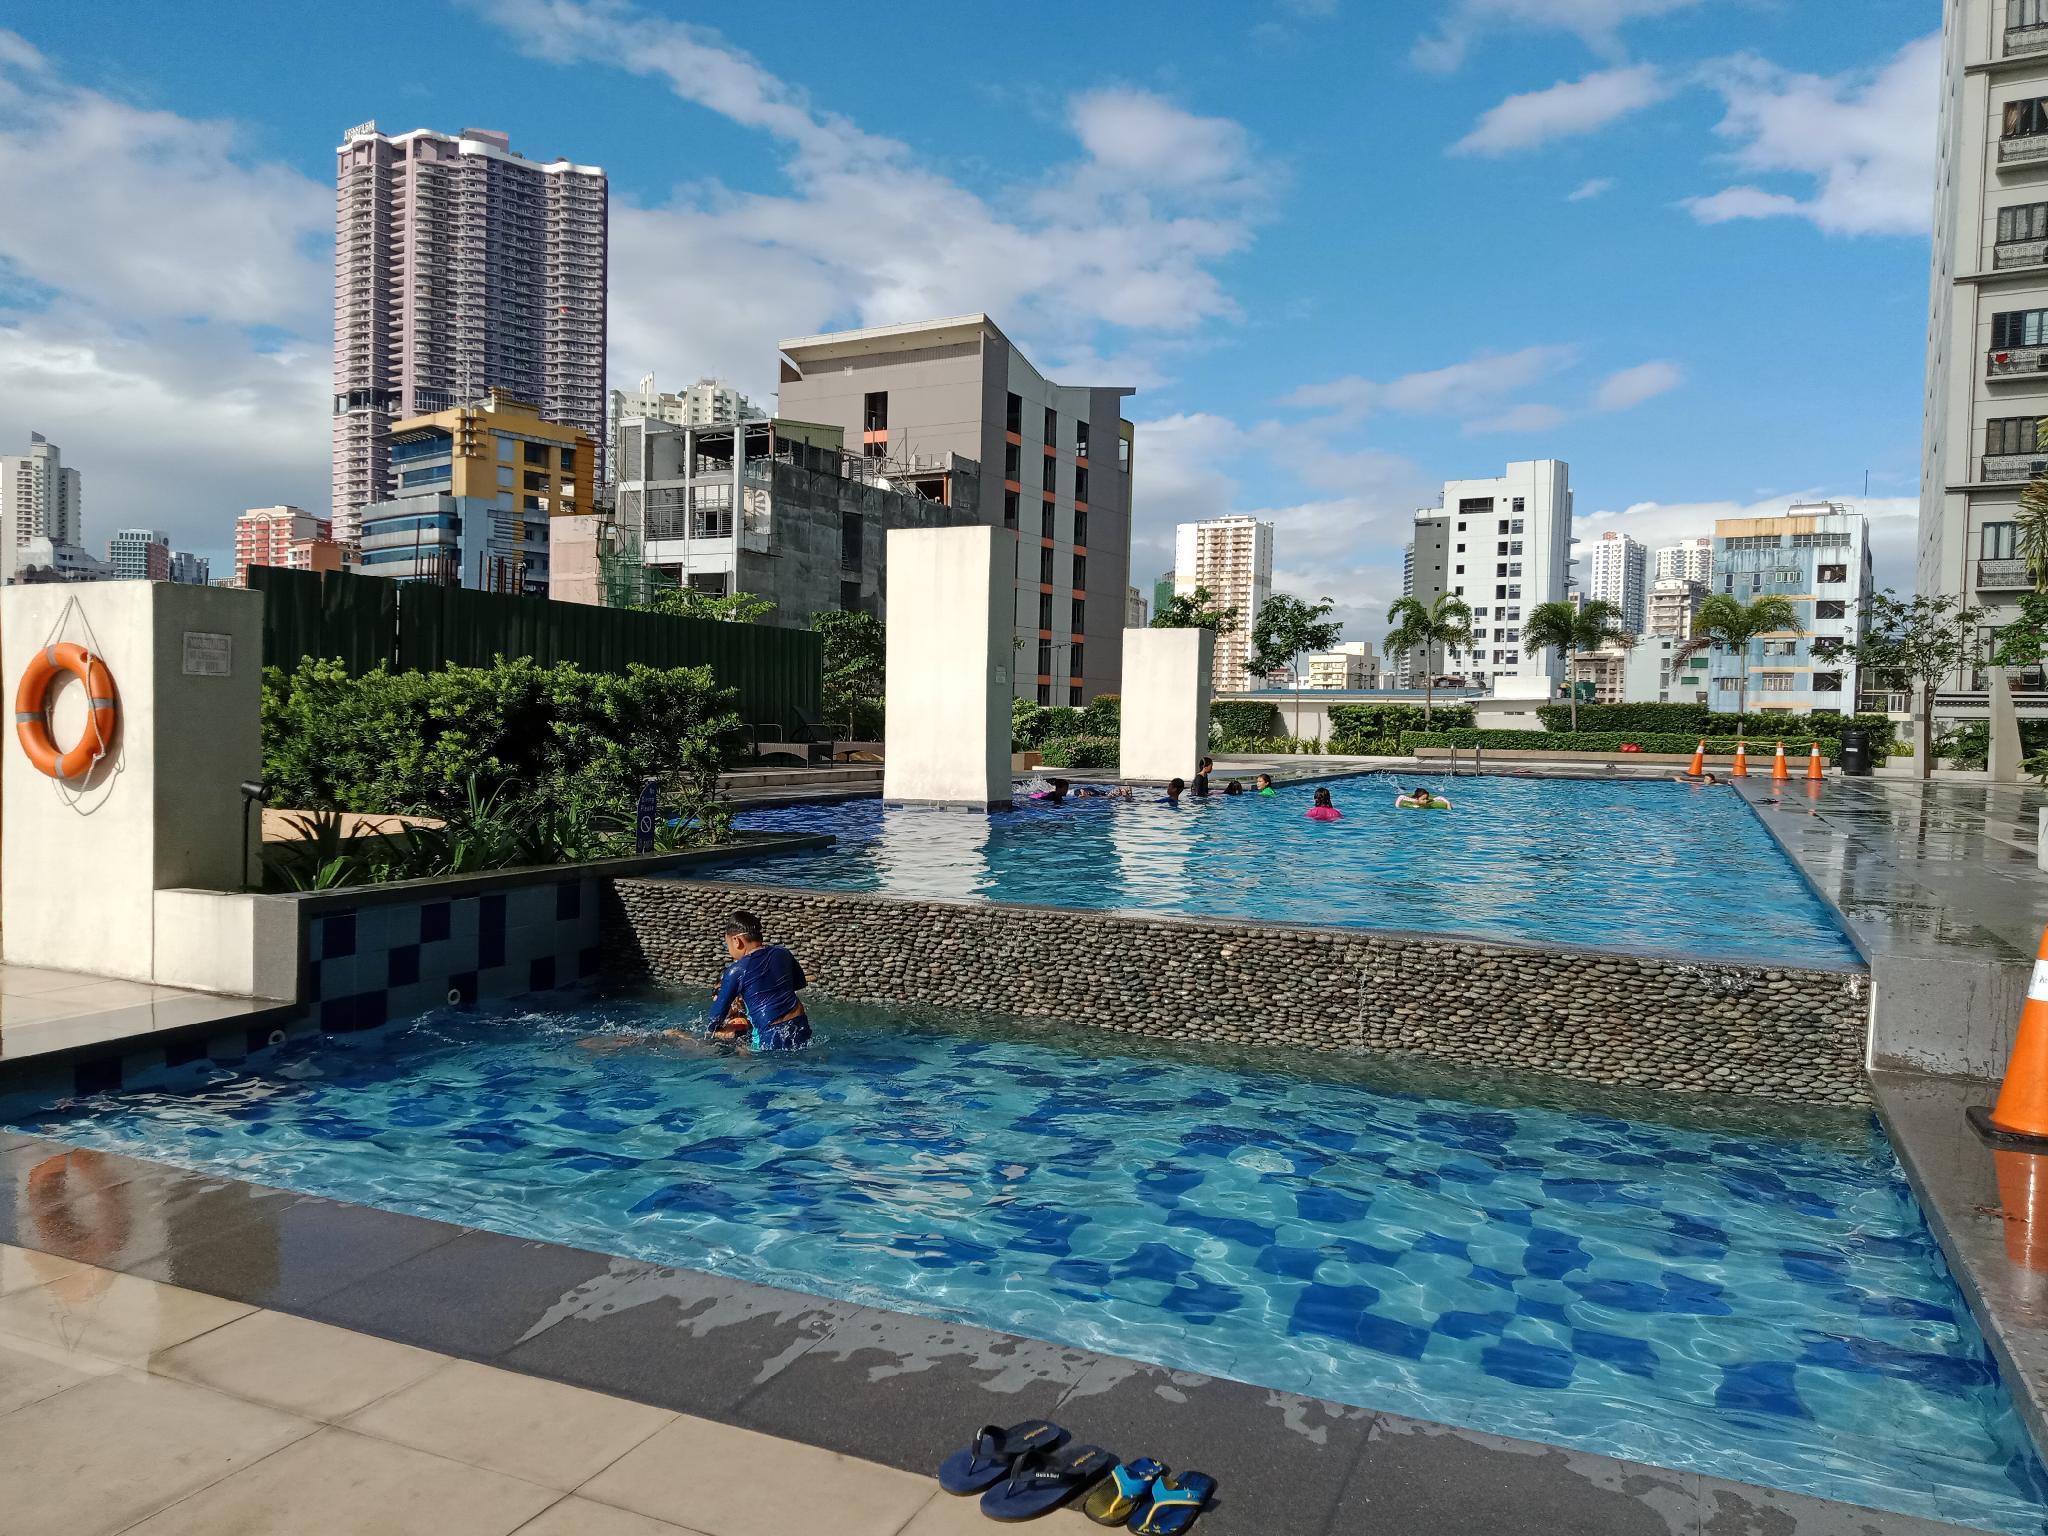 OYO Amaia Skies Avenida Staycation for Group